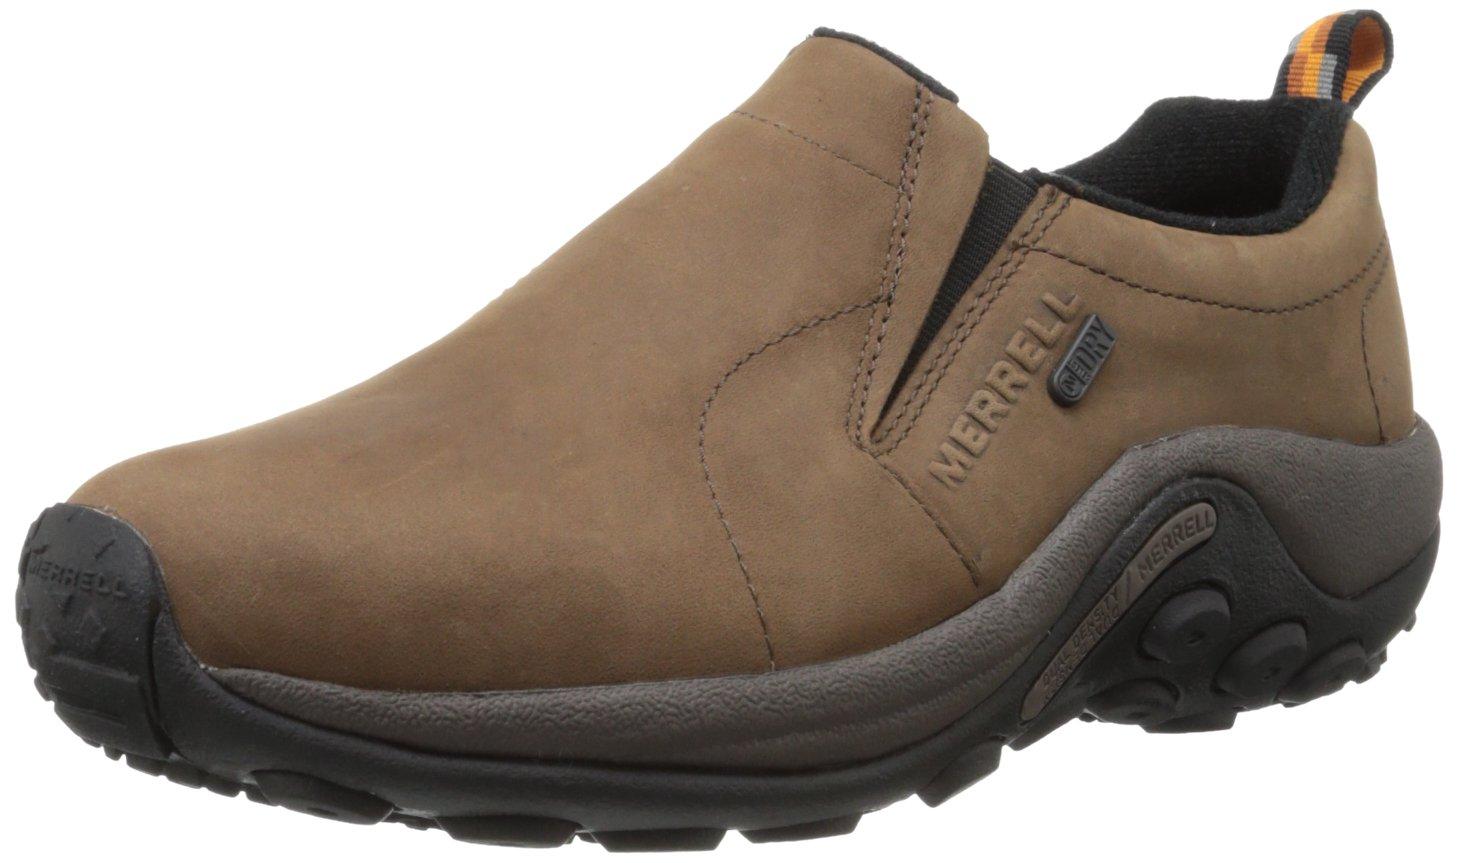 Merrell Men's Jungle Moc Nubuck Waterproof Slip-On Shoe,Brown,12 M US by Merrell